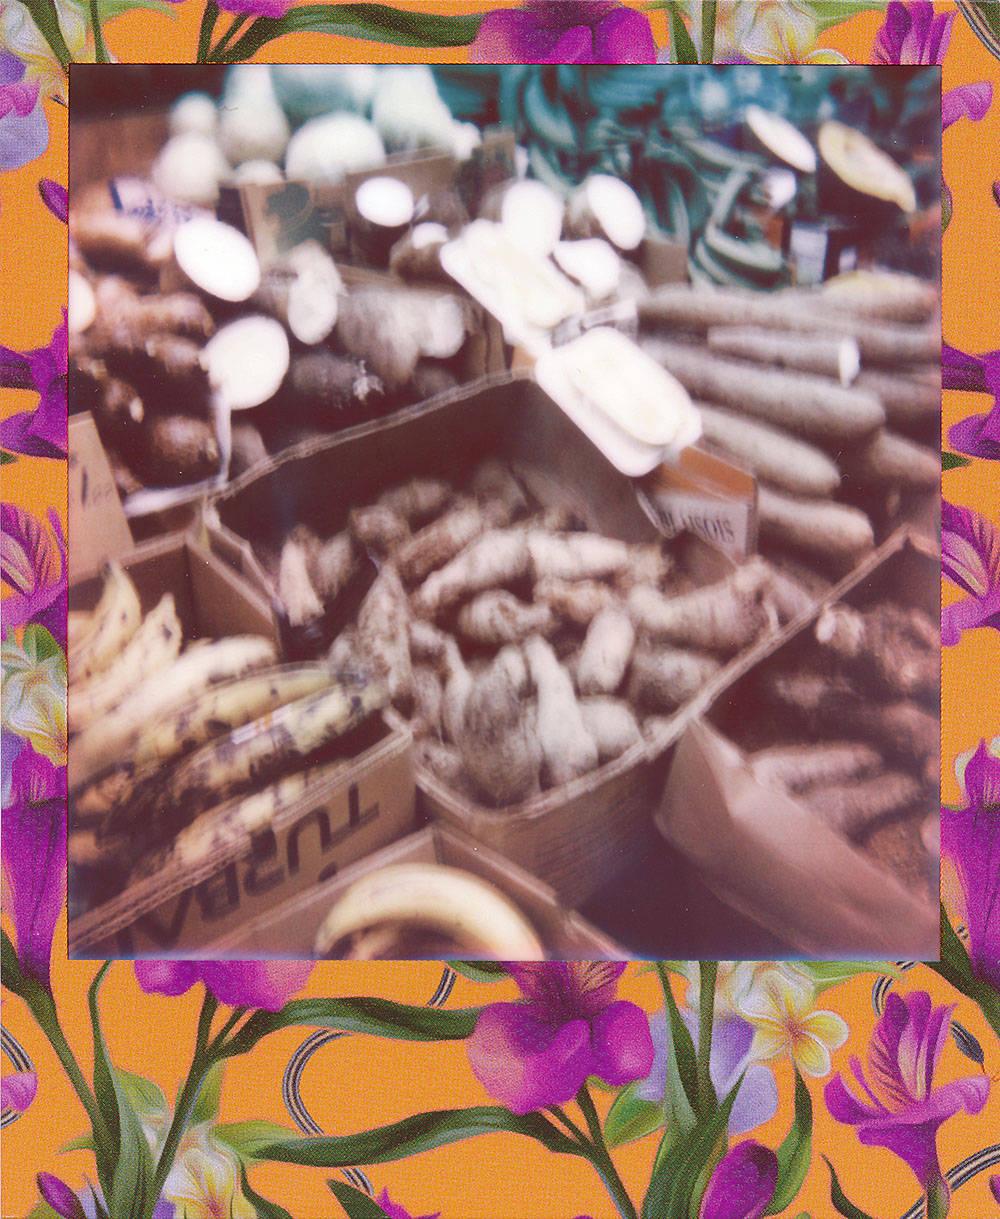 brixton food markets (13)